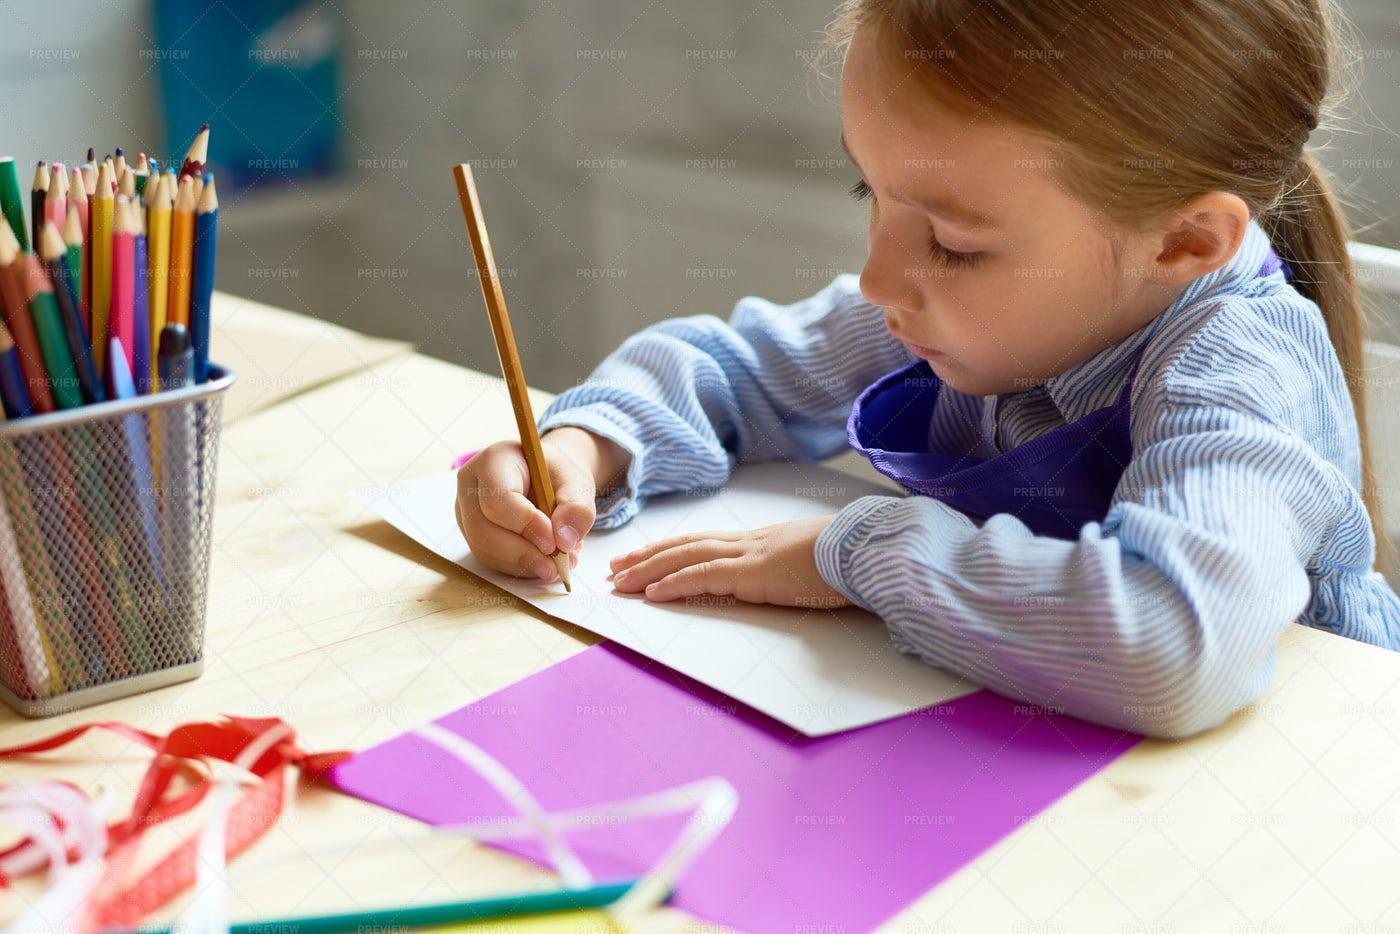 Cute Girl Drawing In Art Class: Stock Photos